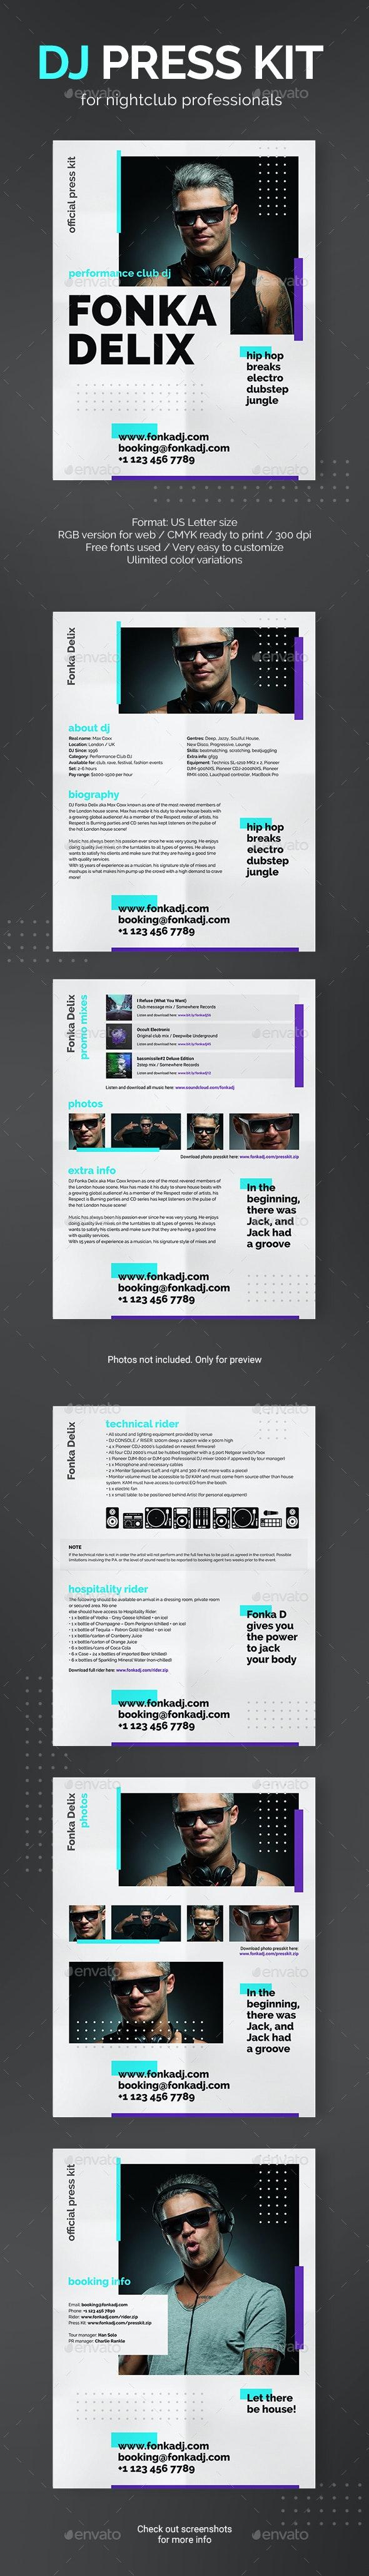 Beatz - DJ Press Kit / DJ Resume / DJ Rider PSD Template - Resumes Stationery